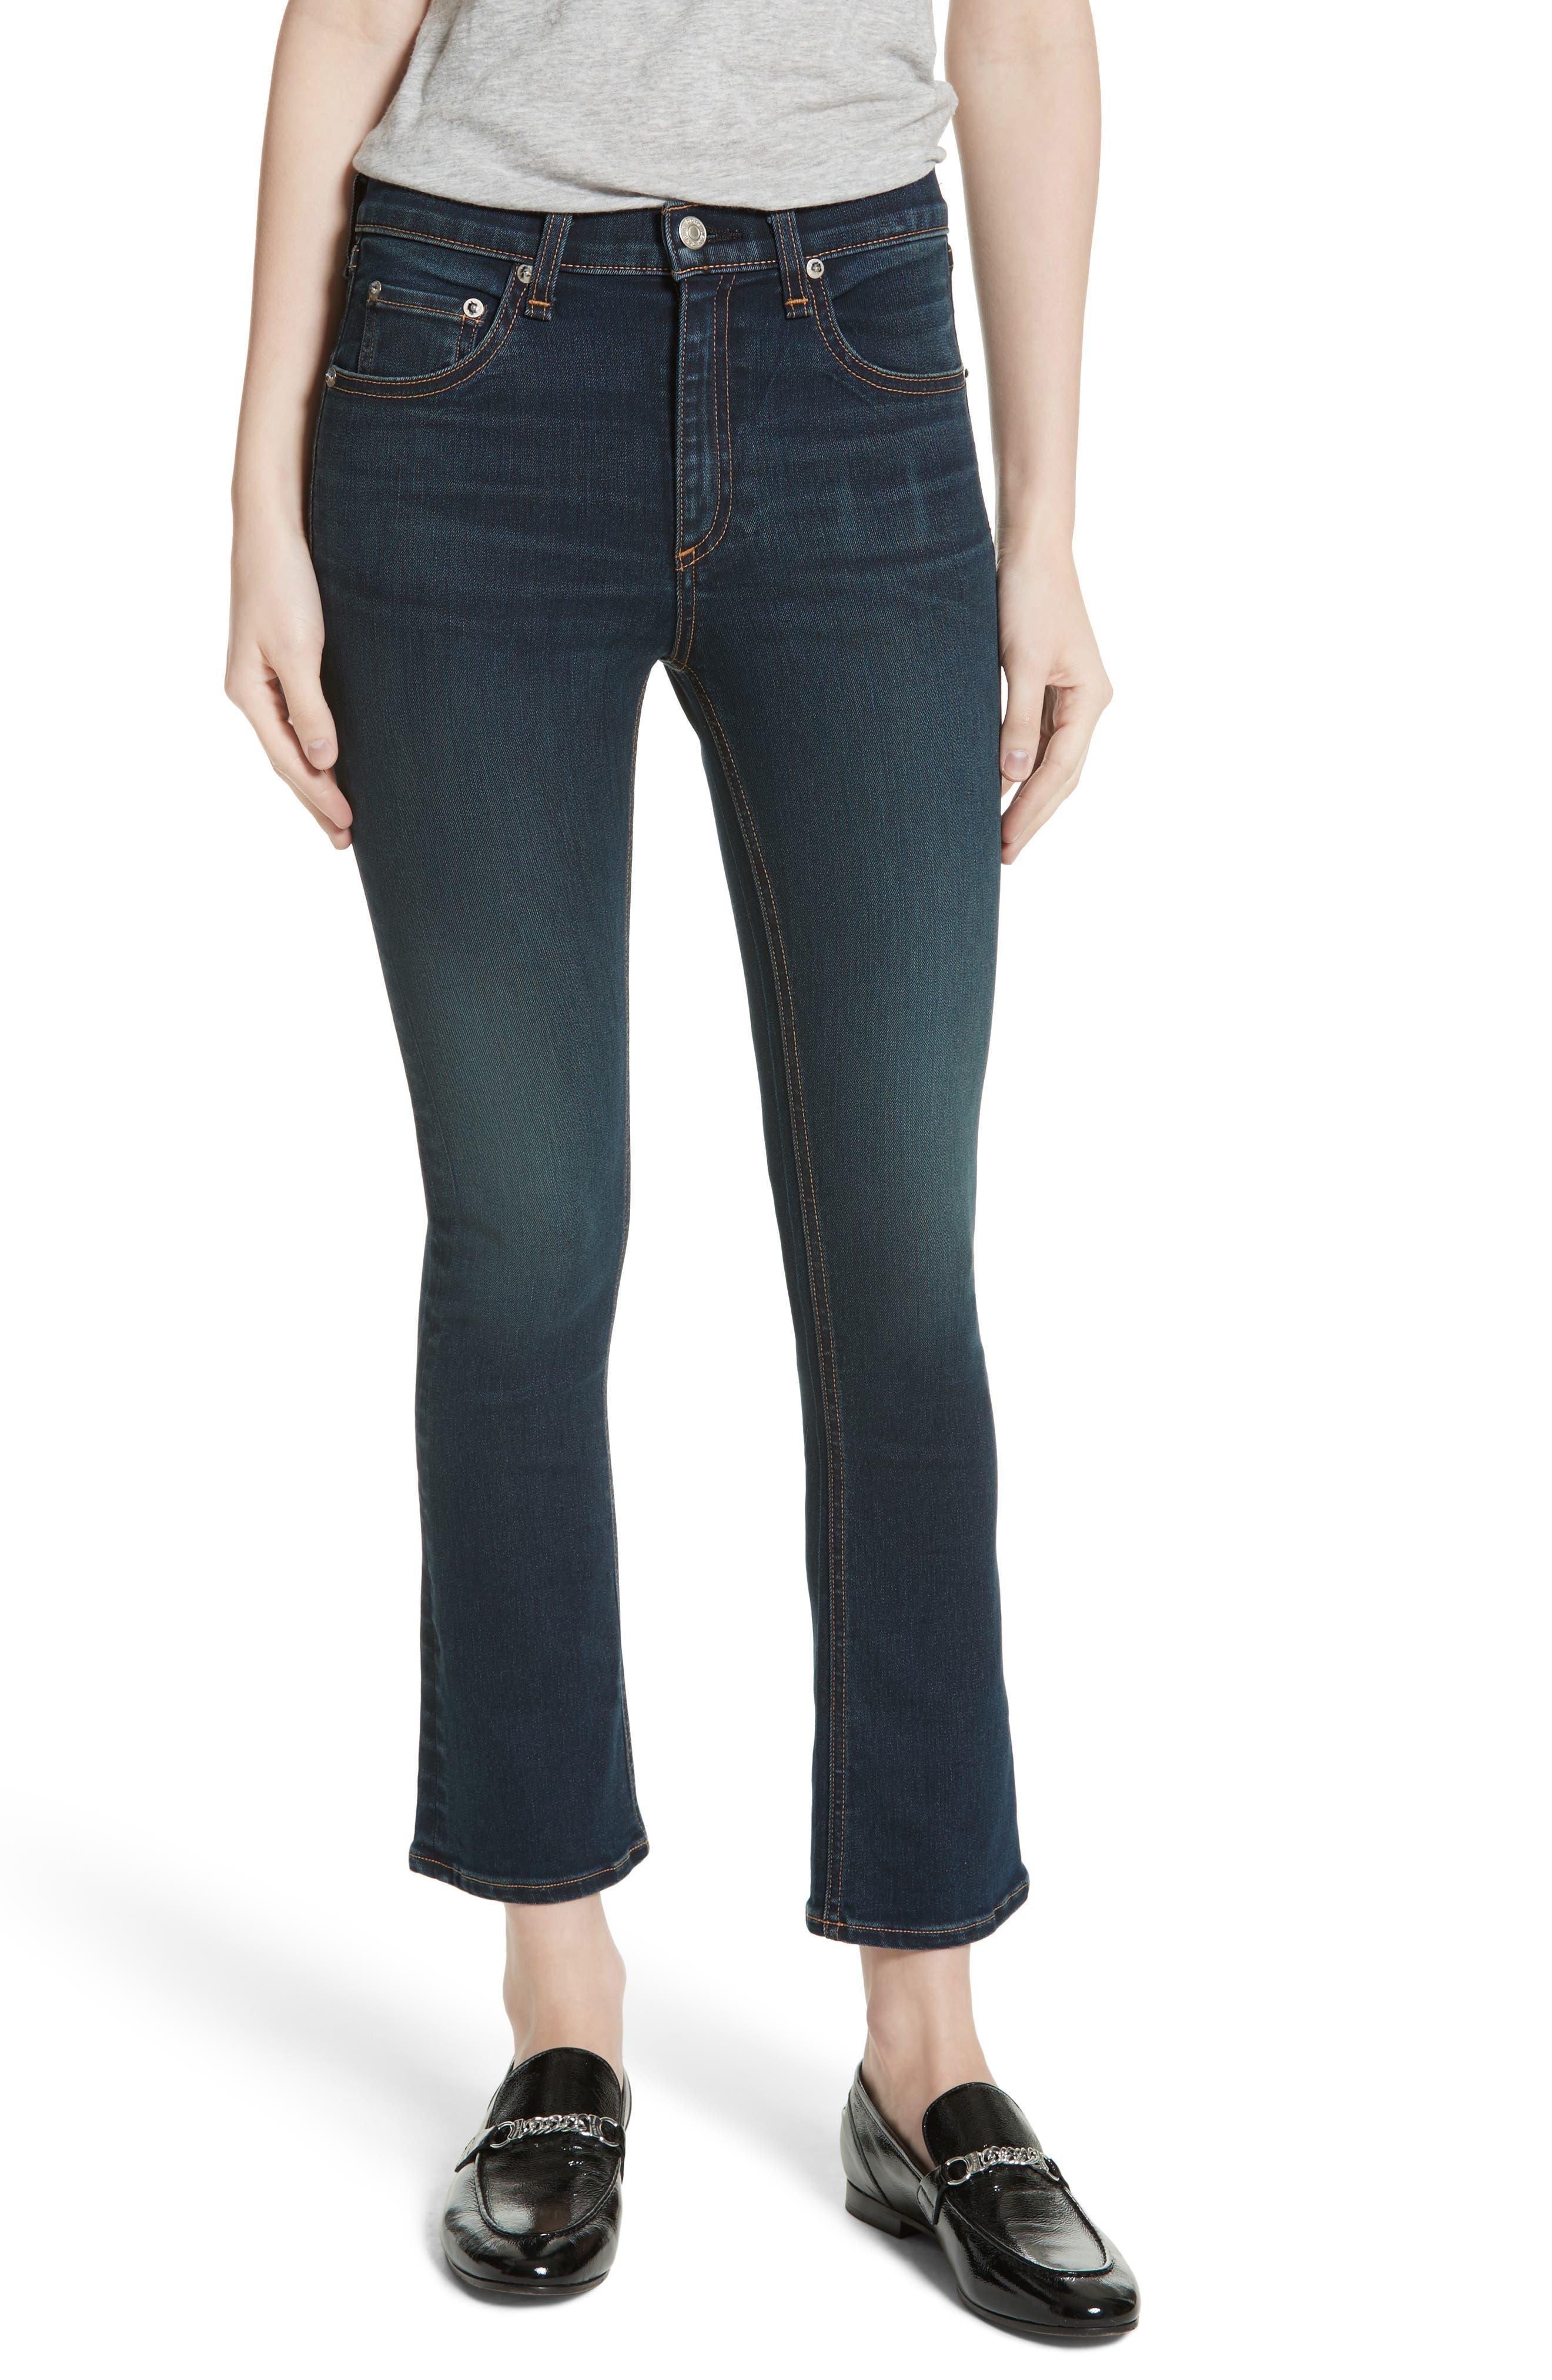 Hana High Waist Crop Flare Jeans,                             Main thumbnail 1, color,                             421